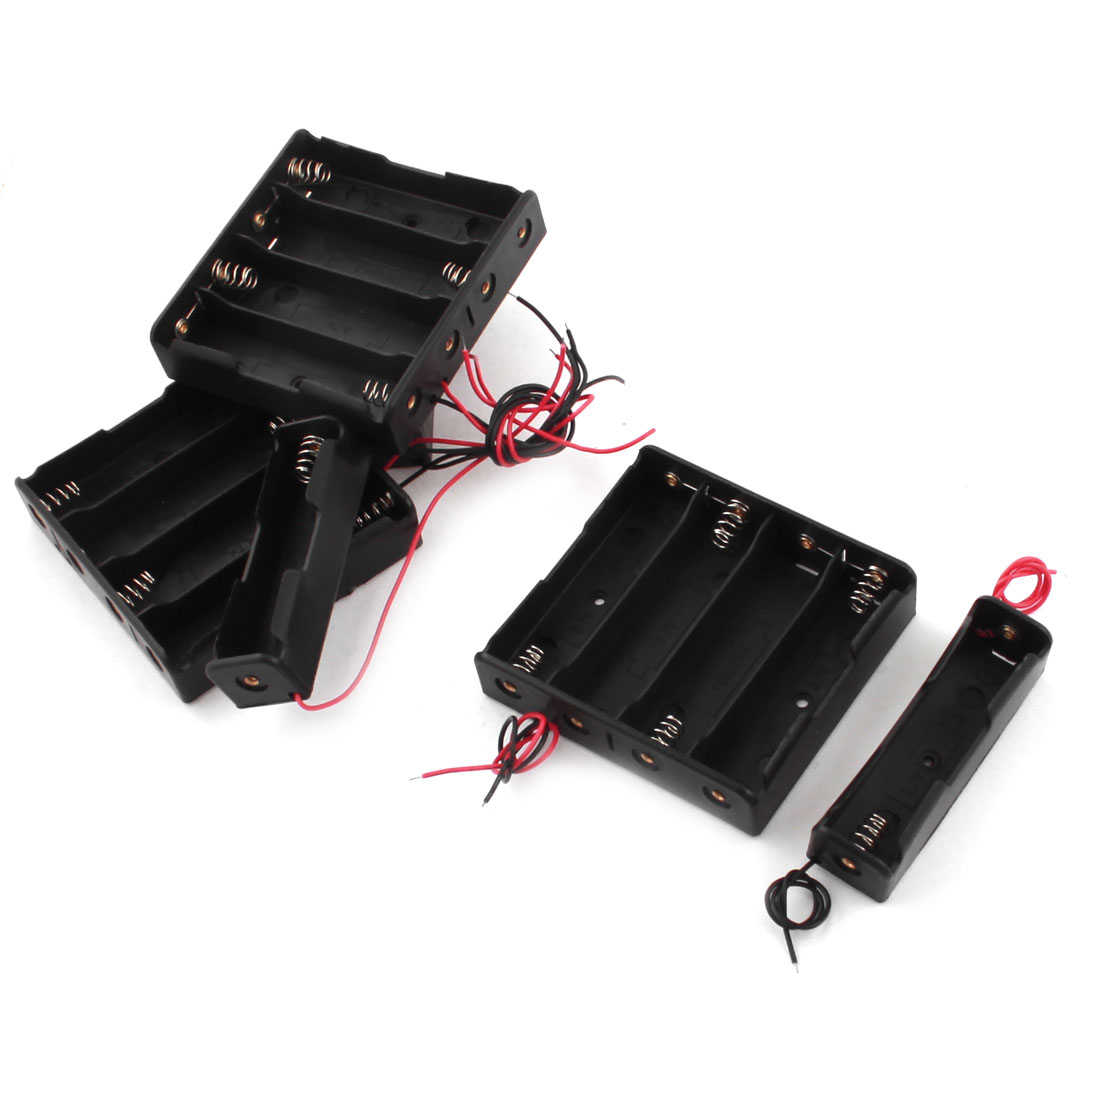 6 in 1 Black Plastic Storage Battery Box Case for 1x 4x 18650 3.7V Batteries